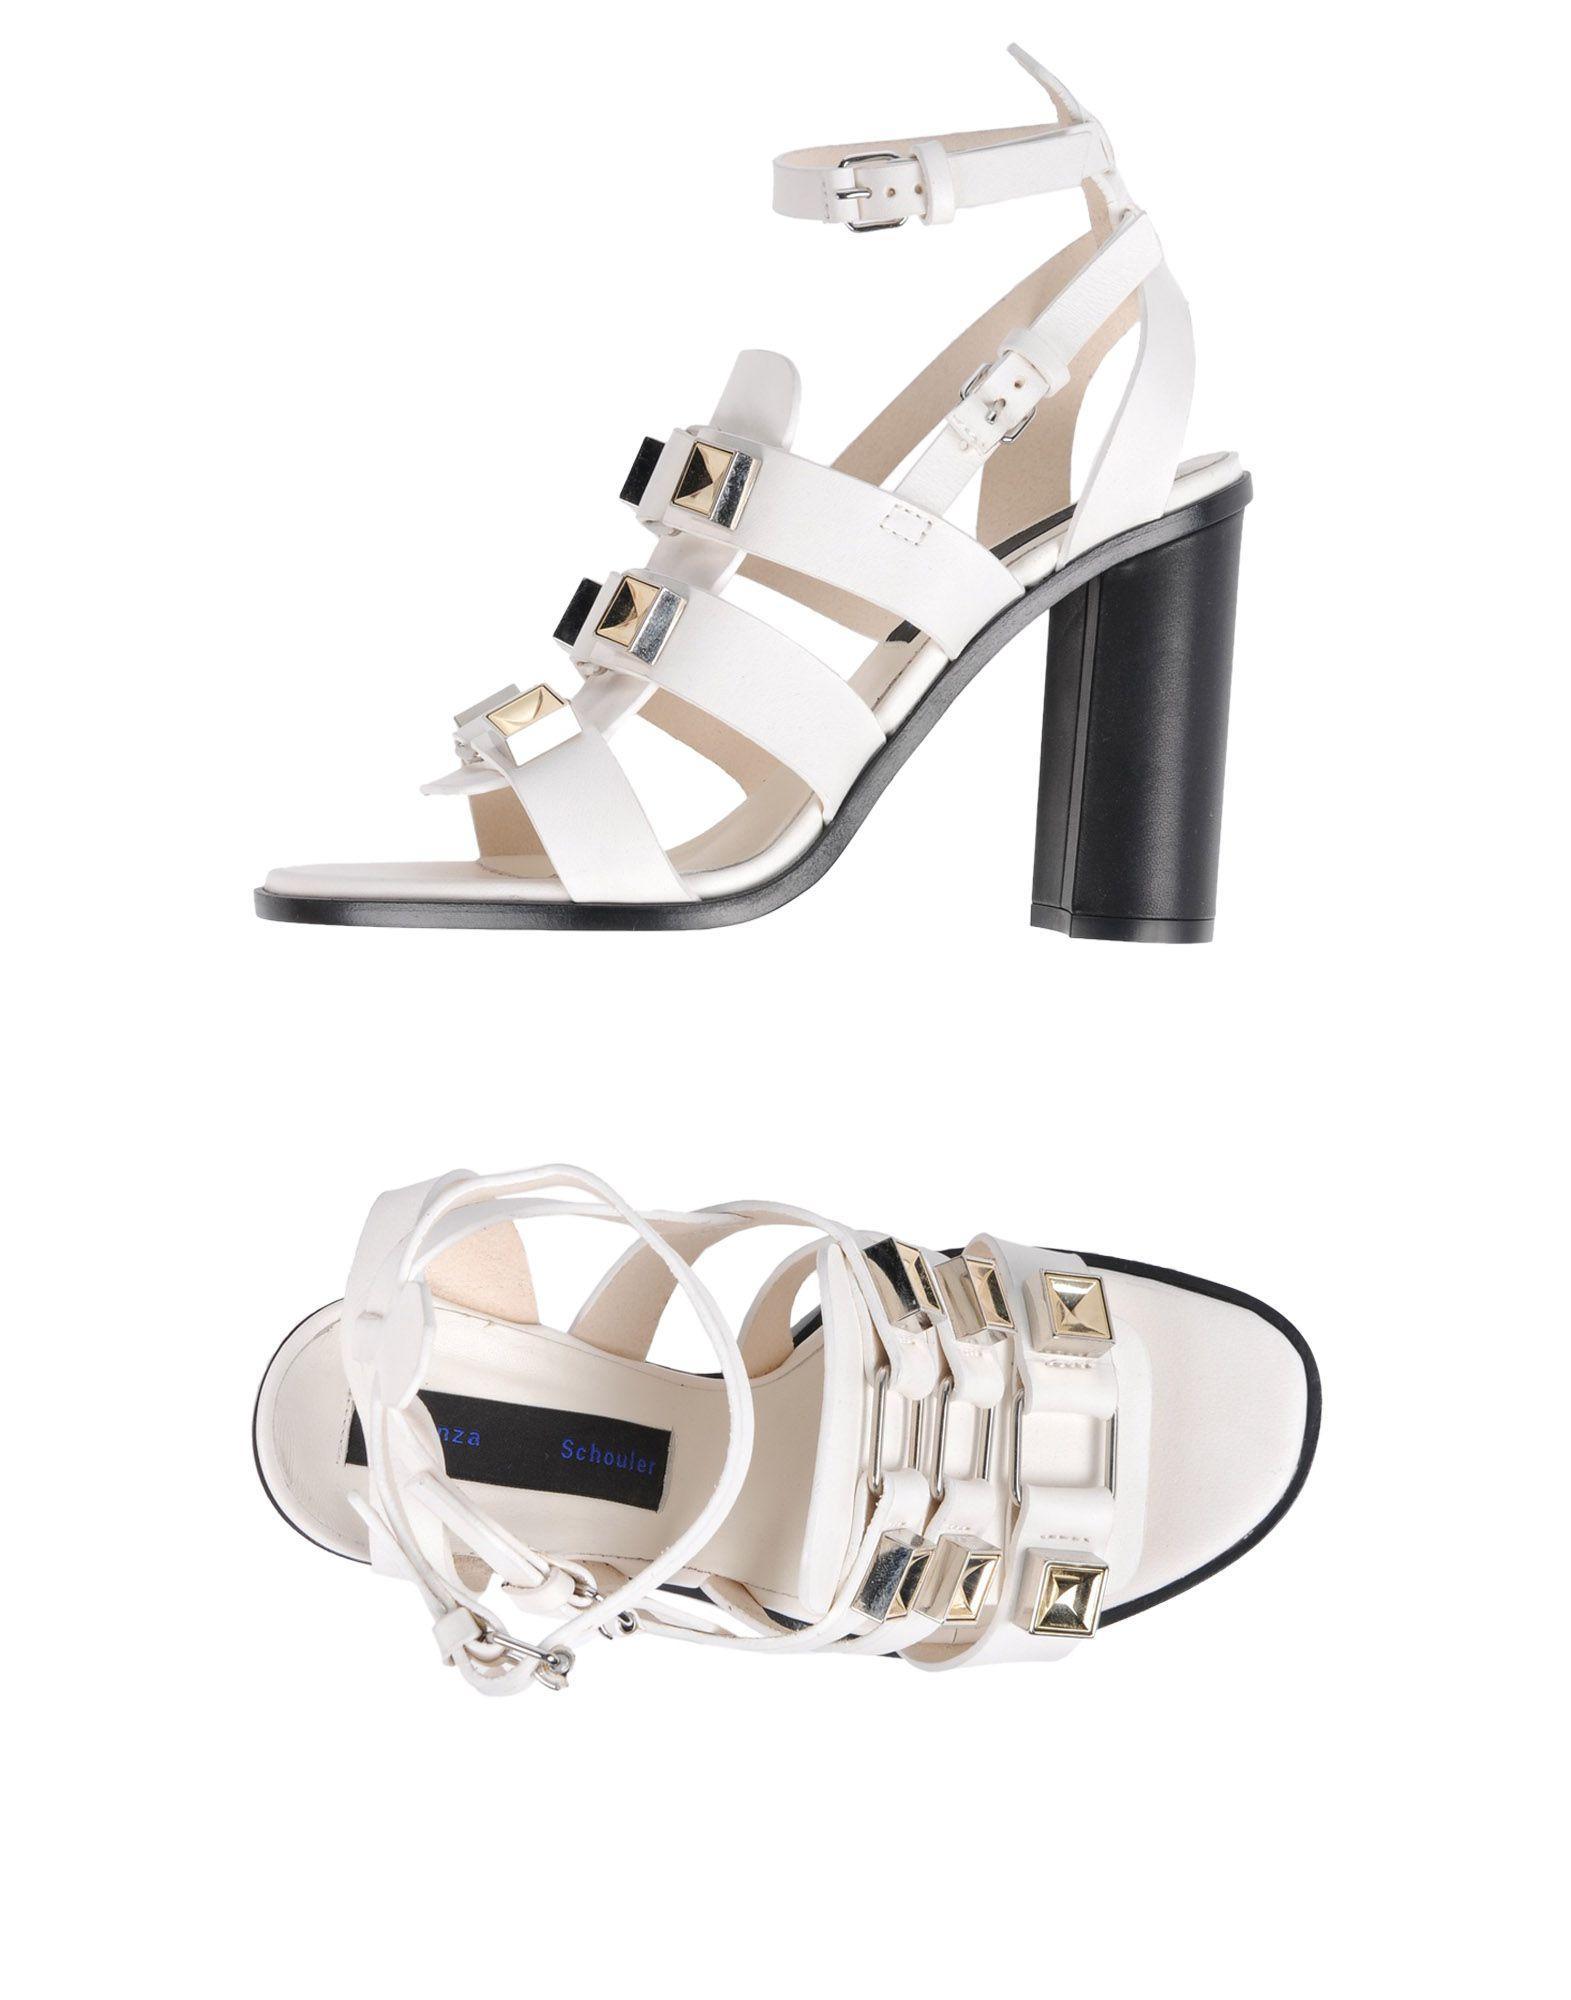 Proenza Schouler Sandals In White